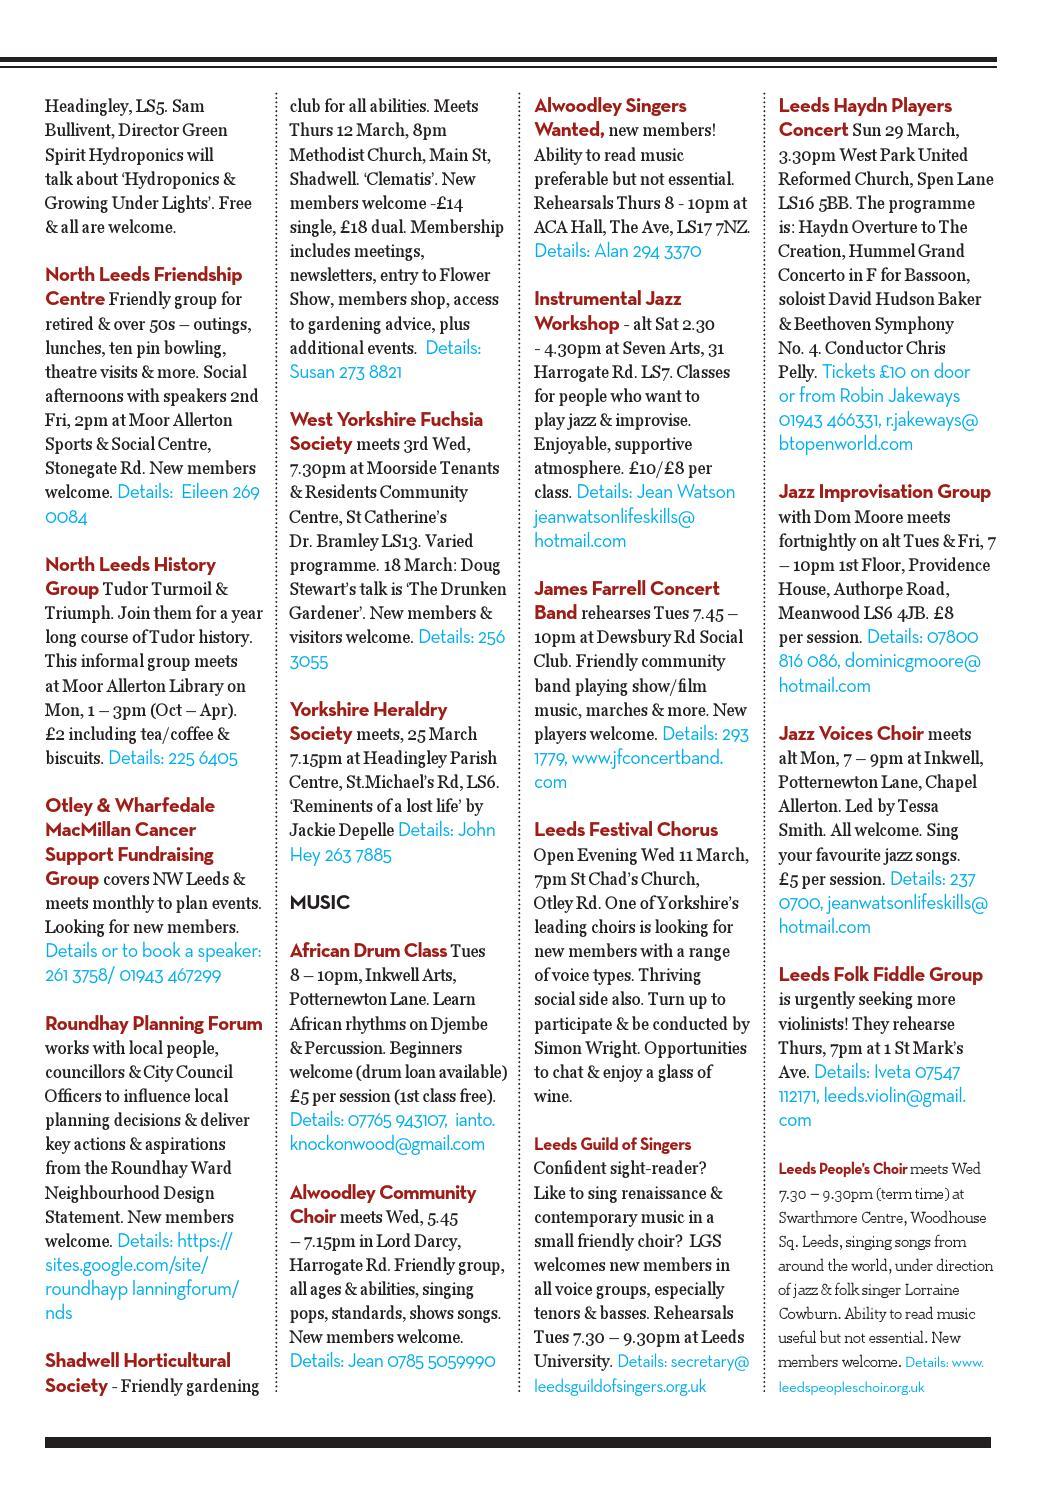 North Leeds Life Magazine  March 2015 Edition  LS7, LS8